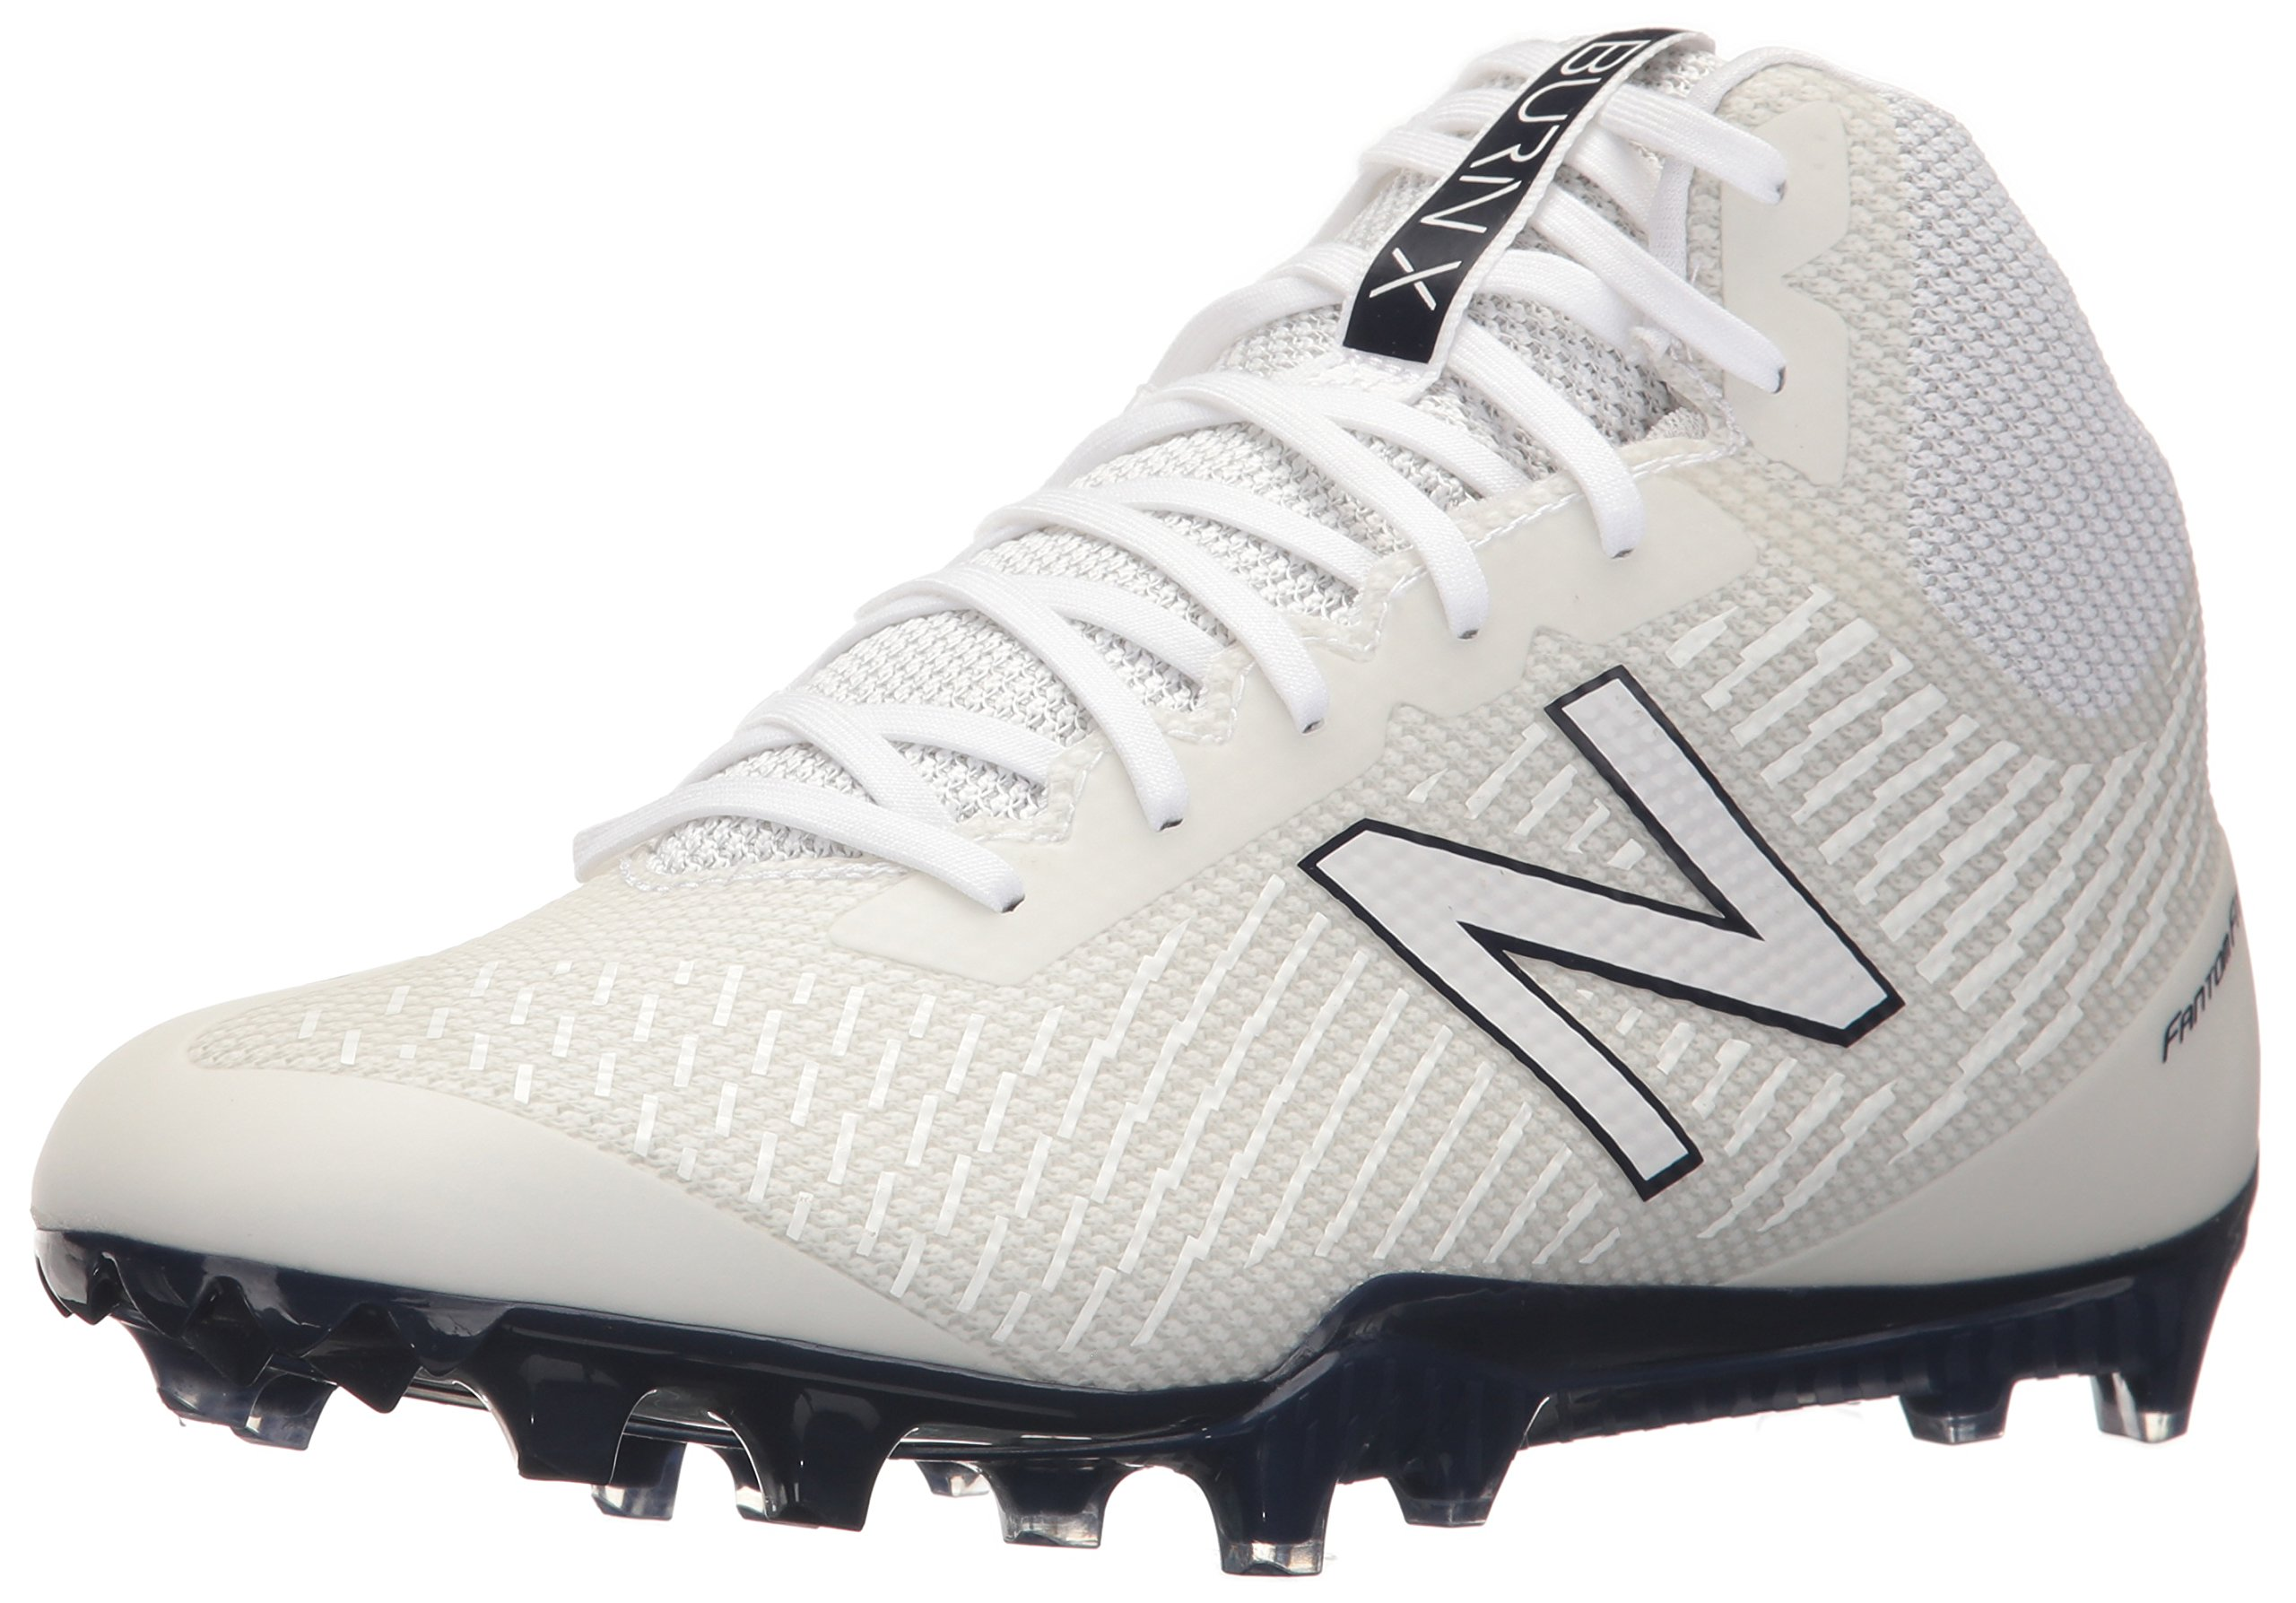 New Balance Men's BURN Mid Speed Lacrosse Shoe, White/Blue, 9.5 D US by New Balance